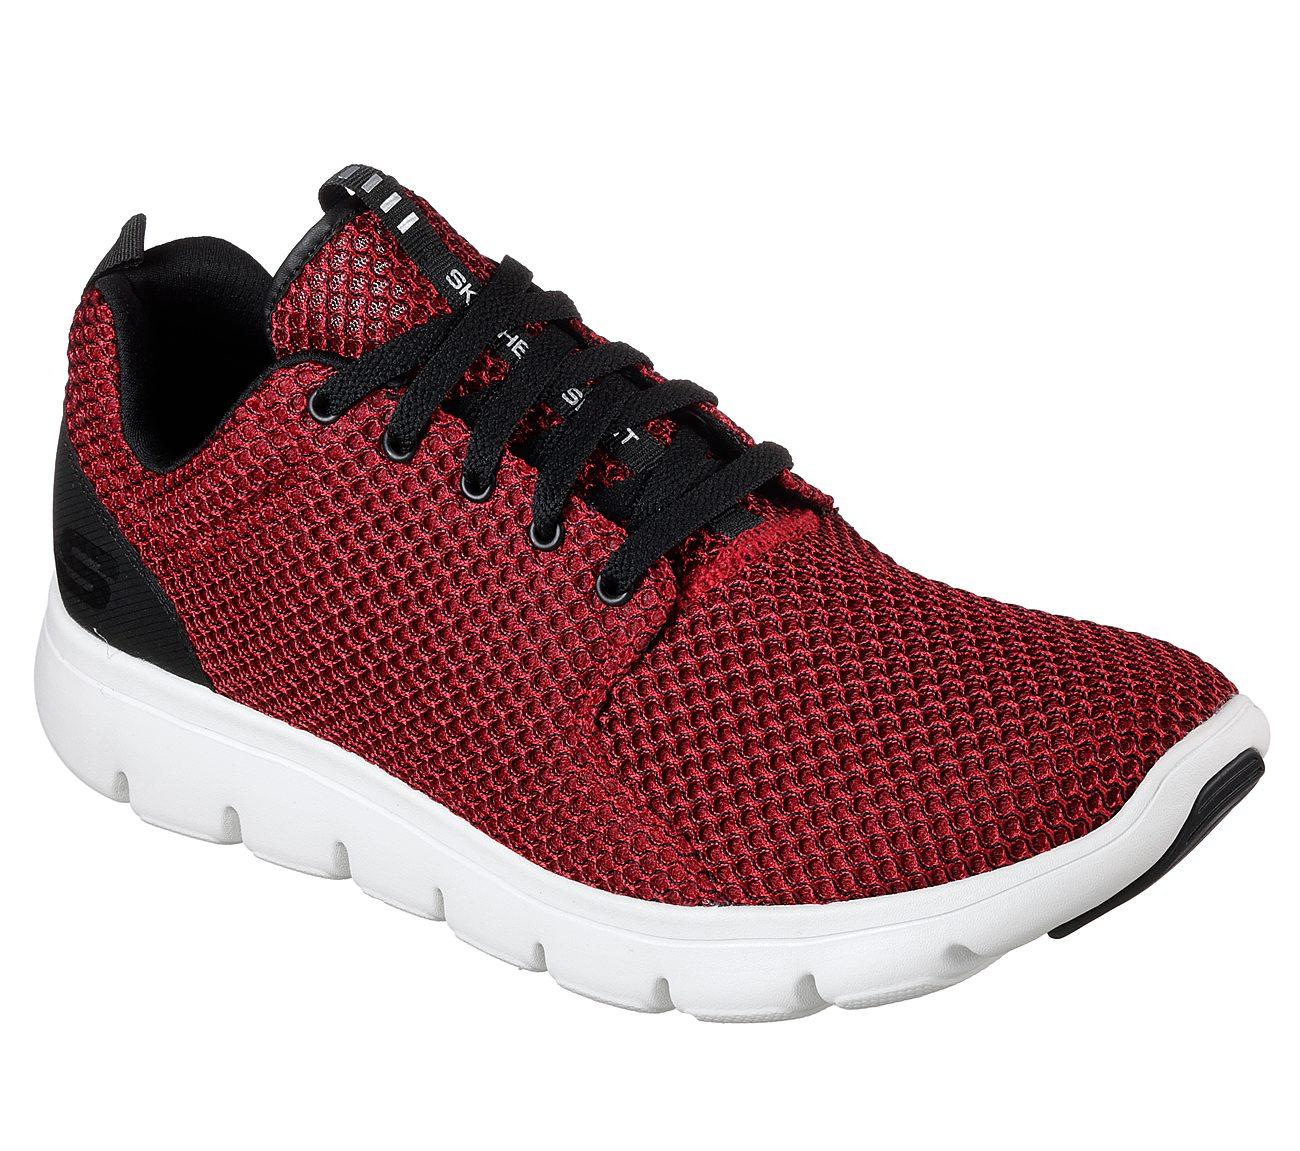 Buy SKECHERS Marauder SKECHERS Sport Shoes